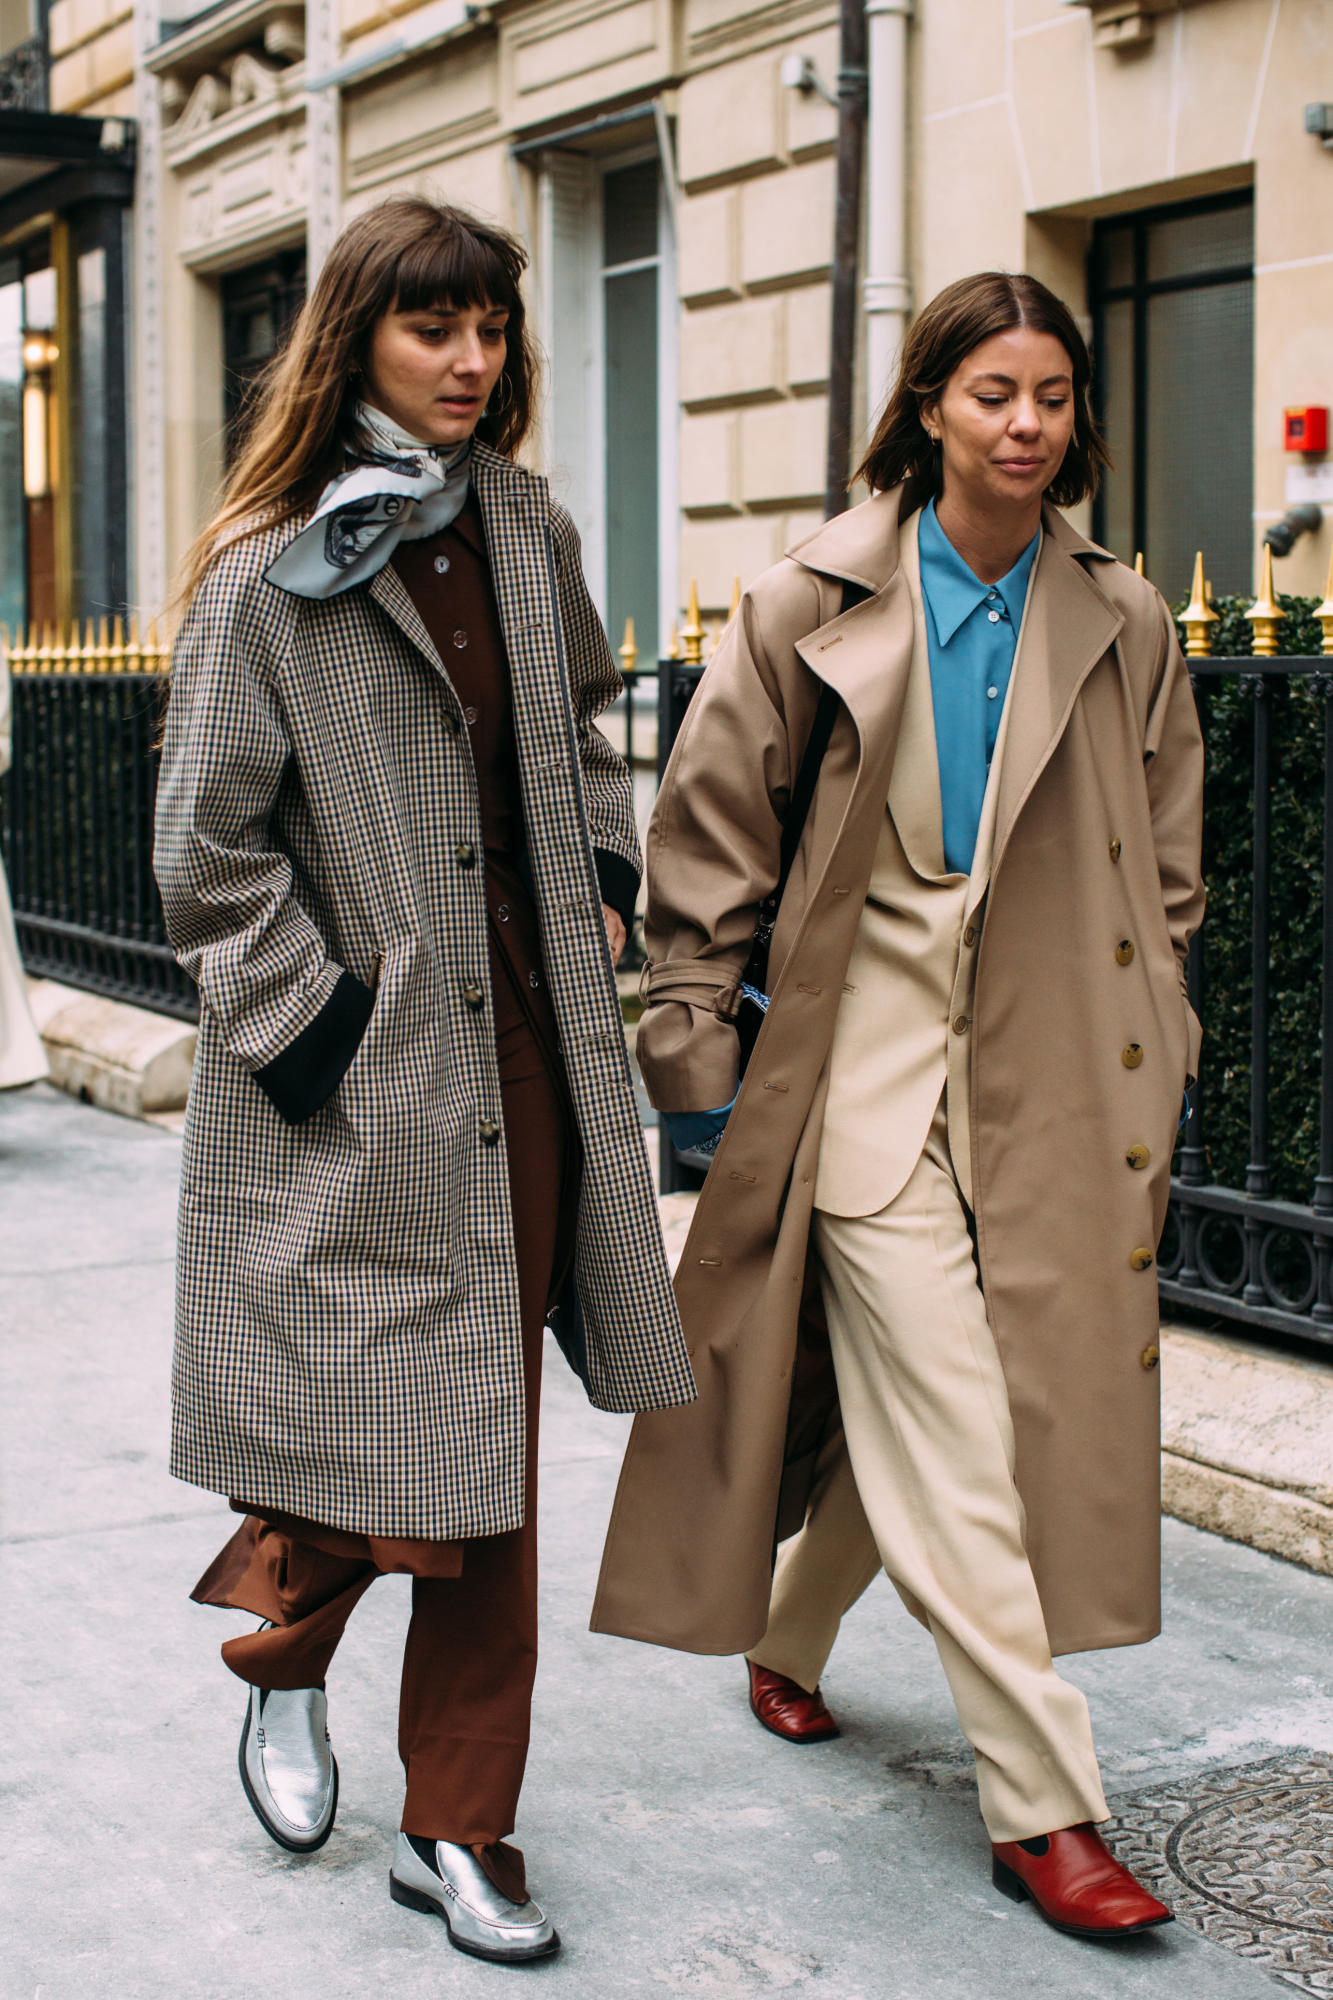 paris-fashion-week-street-style-fall-2018-day-3-53.jpg